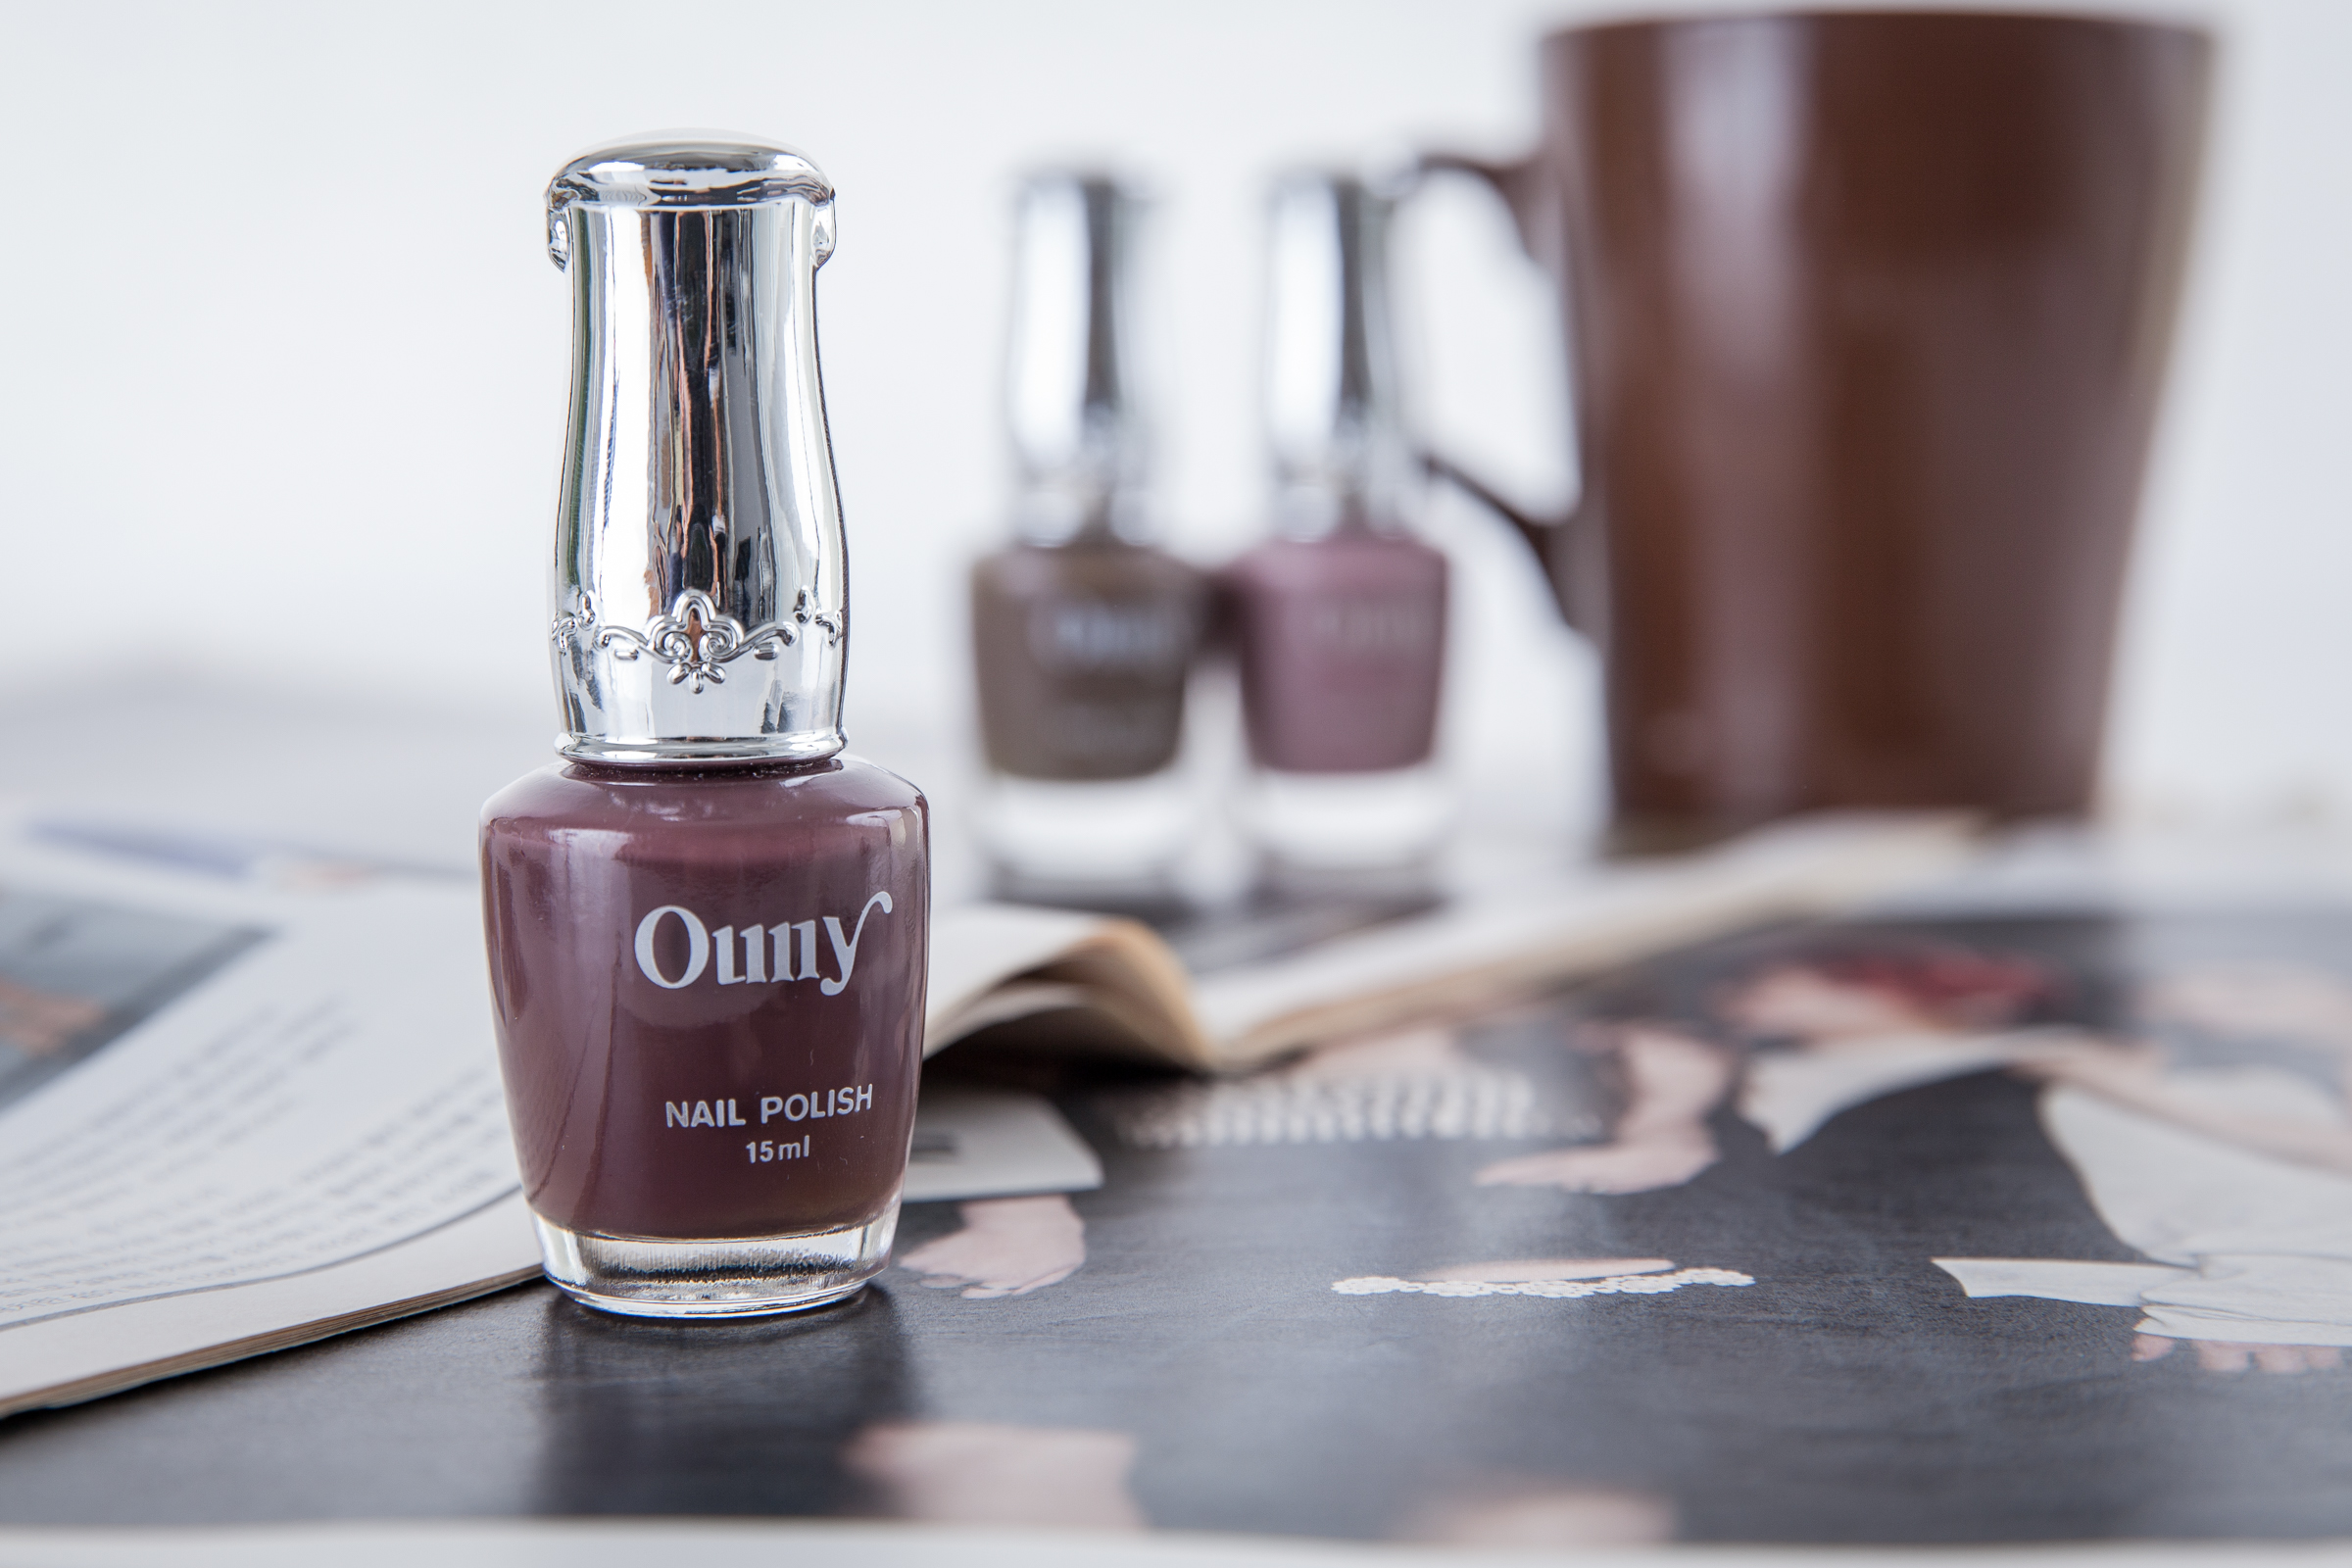 【Ouny歐尼】x 【奇幻之旅系列Ouny專業指彩15ml 】 New Arrival 新品搶購7折(限時)